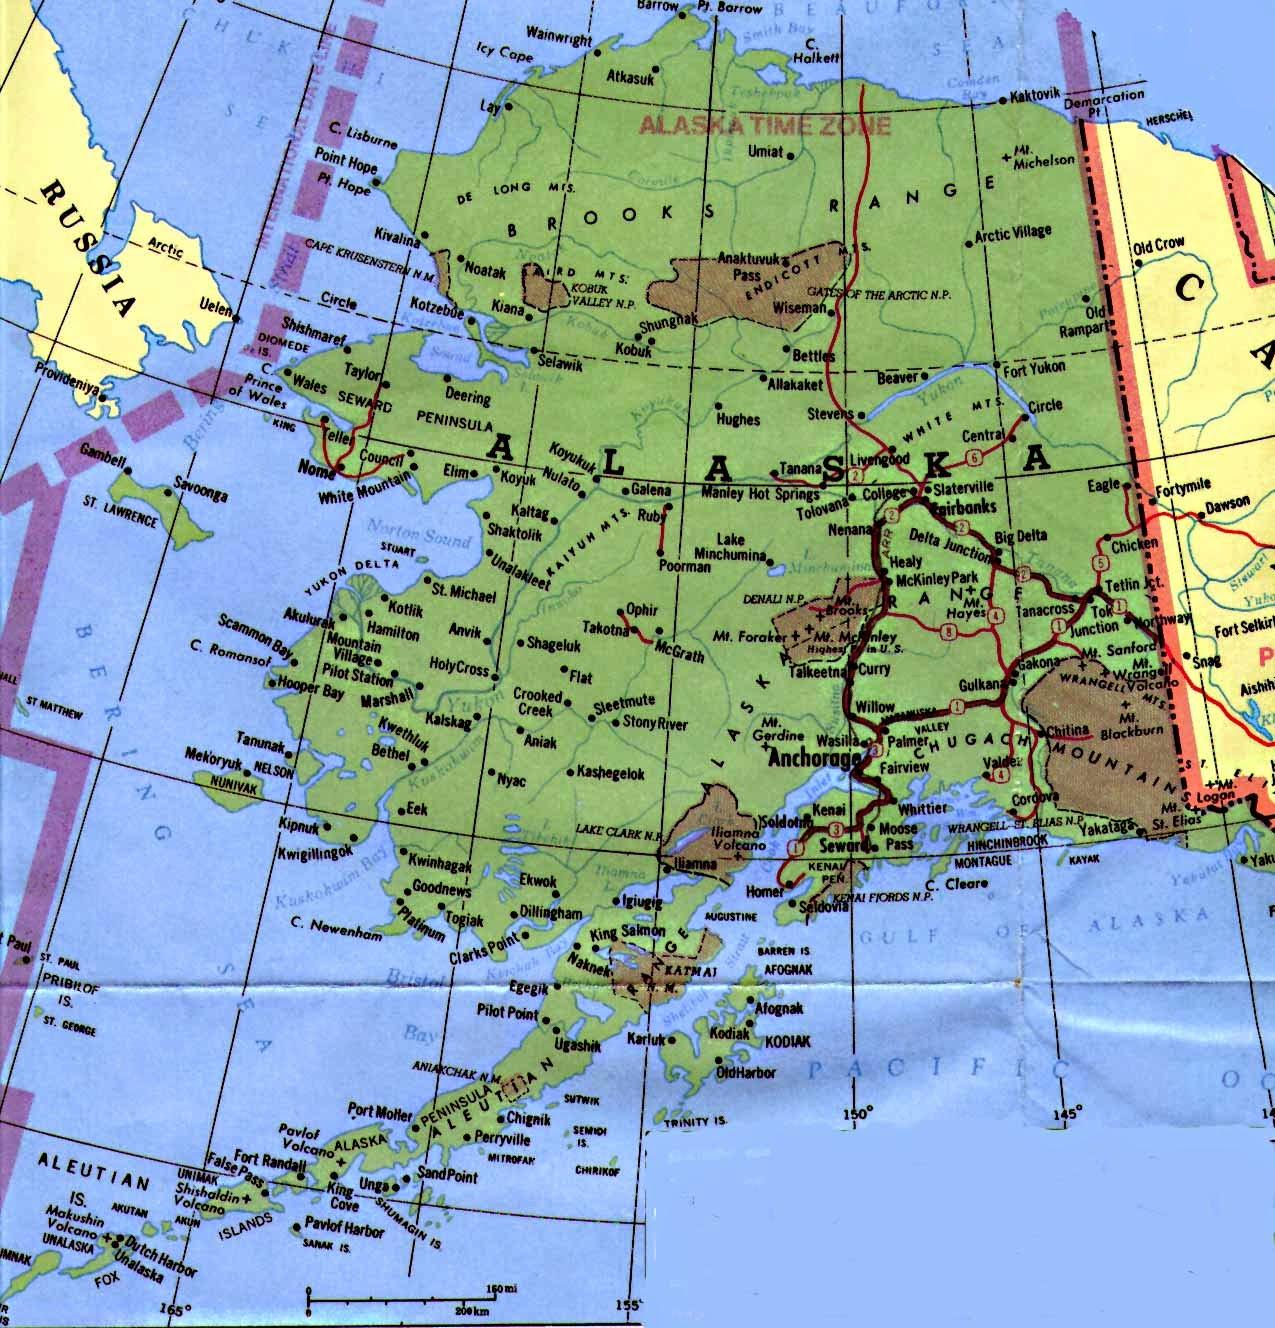 following pdf map of the polar world includes canada http geogratis gc ca api en nrcan rncan ess sst 17d906a4 8a7e 5ad1 8e40 fa54dac1787a html